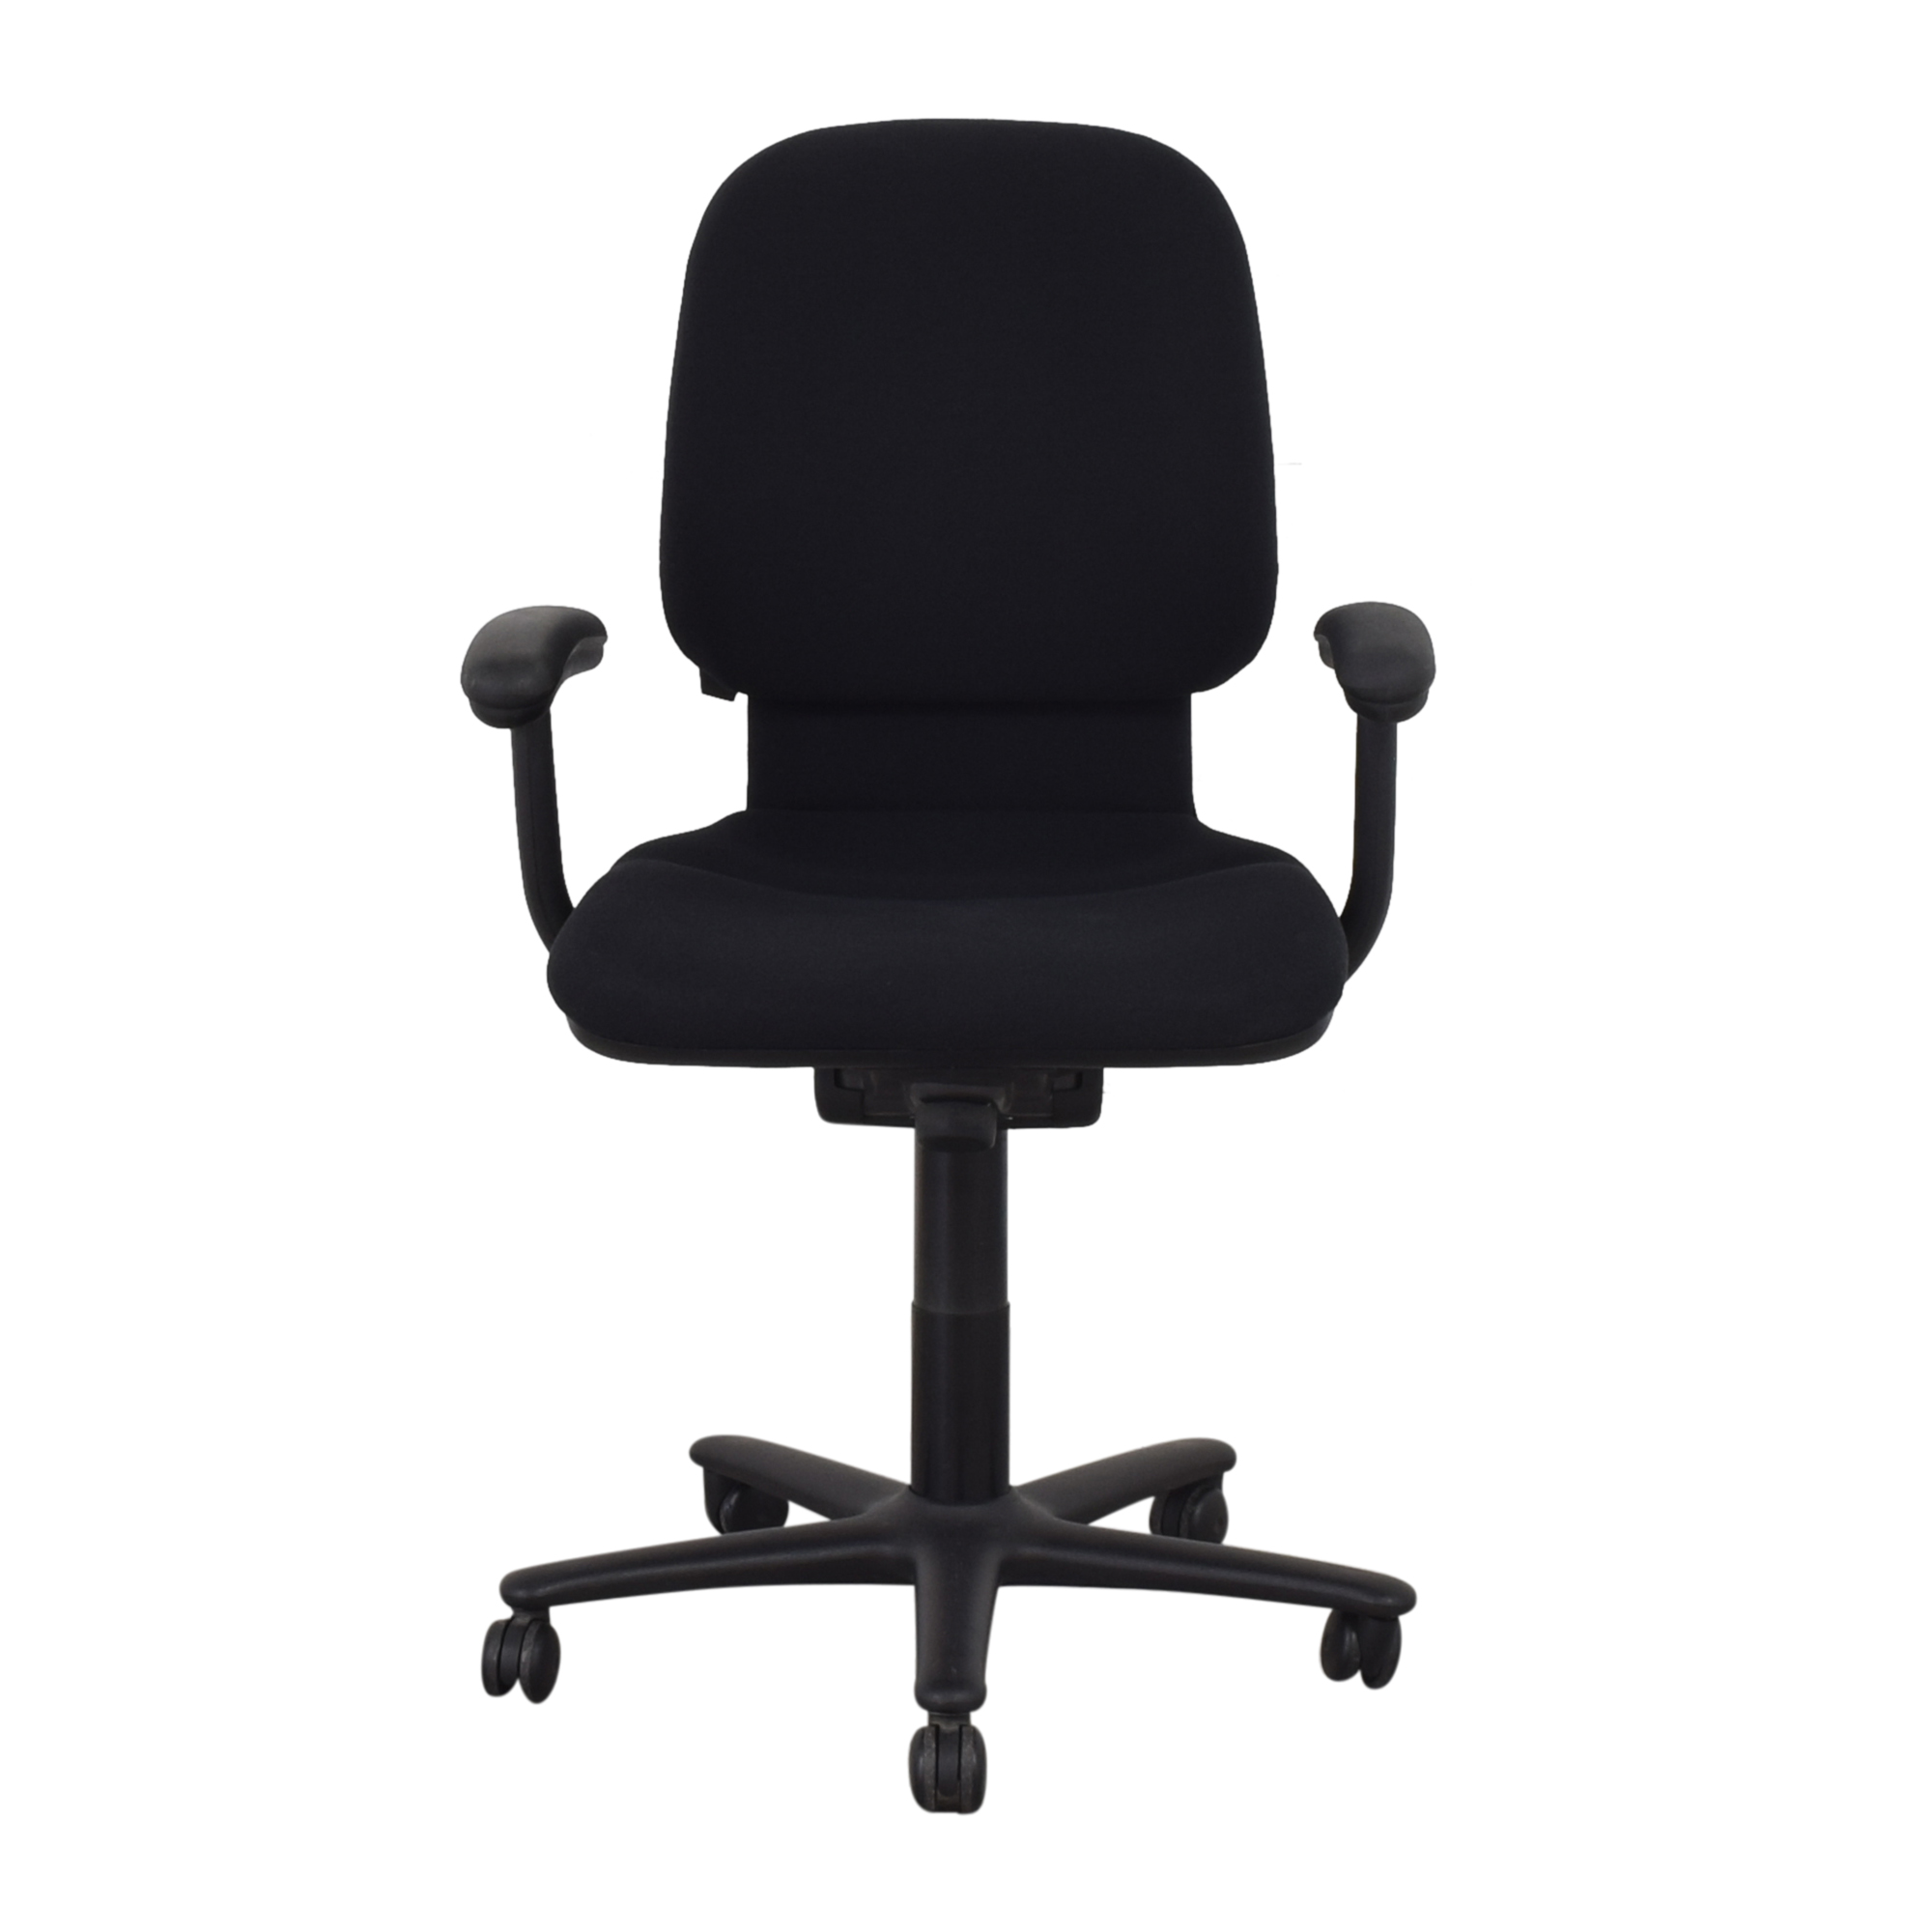 Steelcase Swivel Desk Chair / Chairs